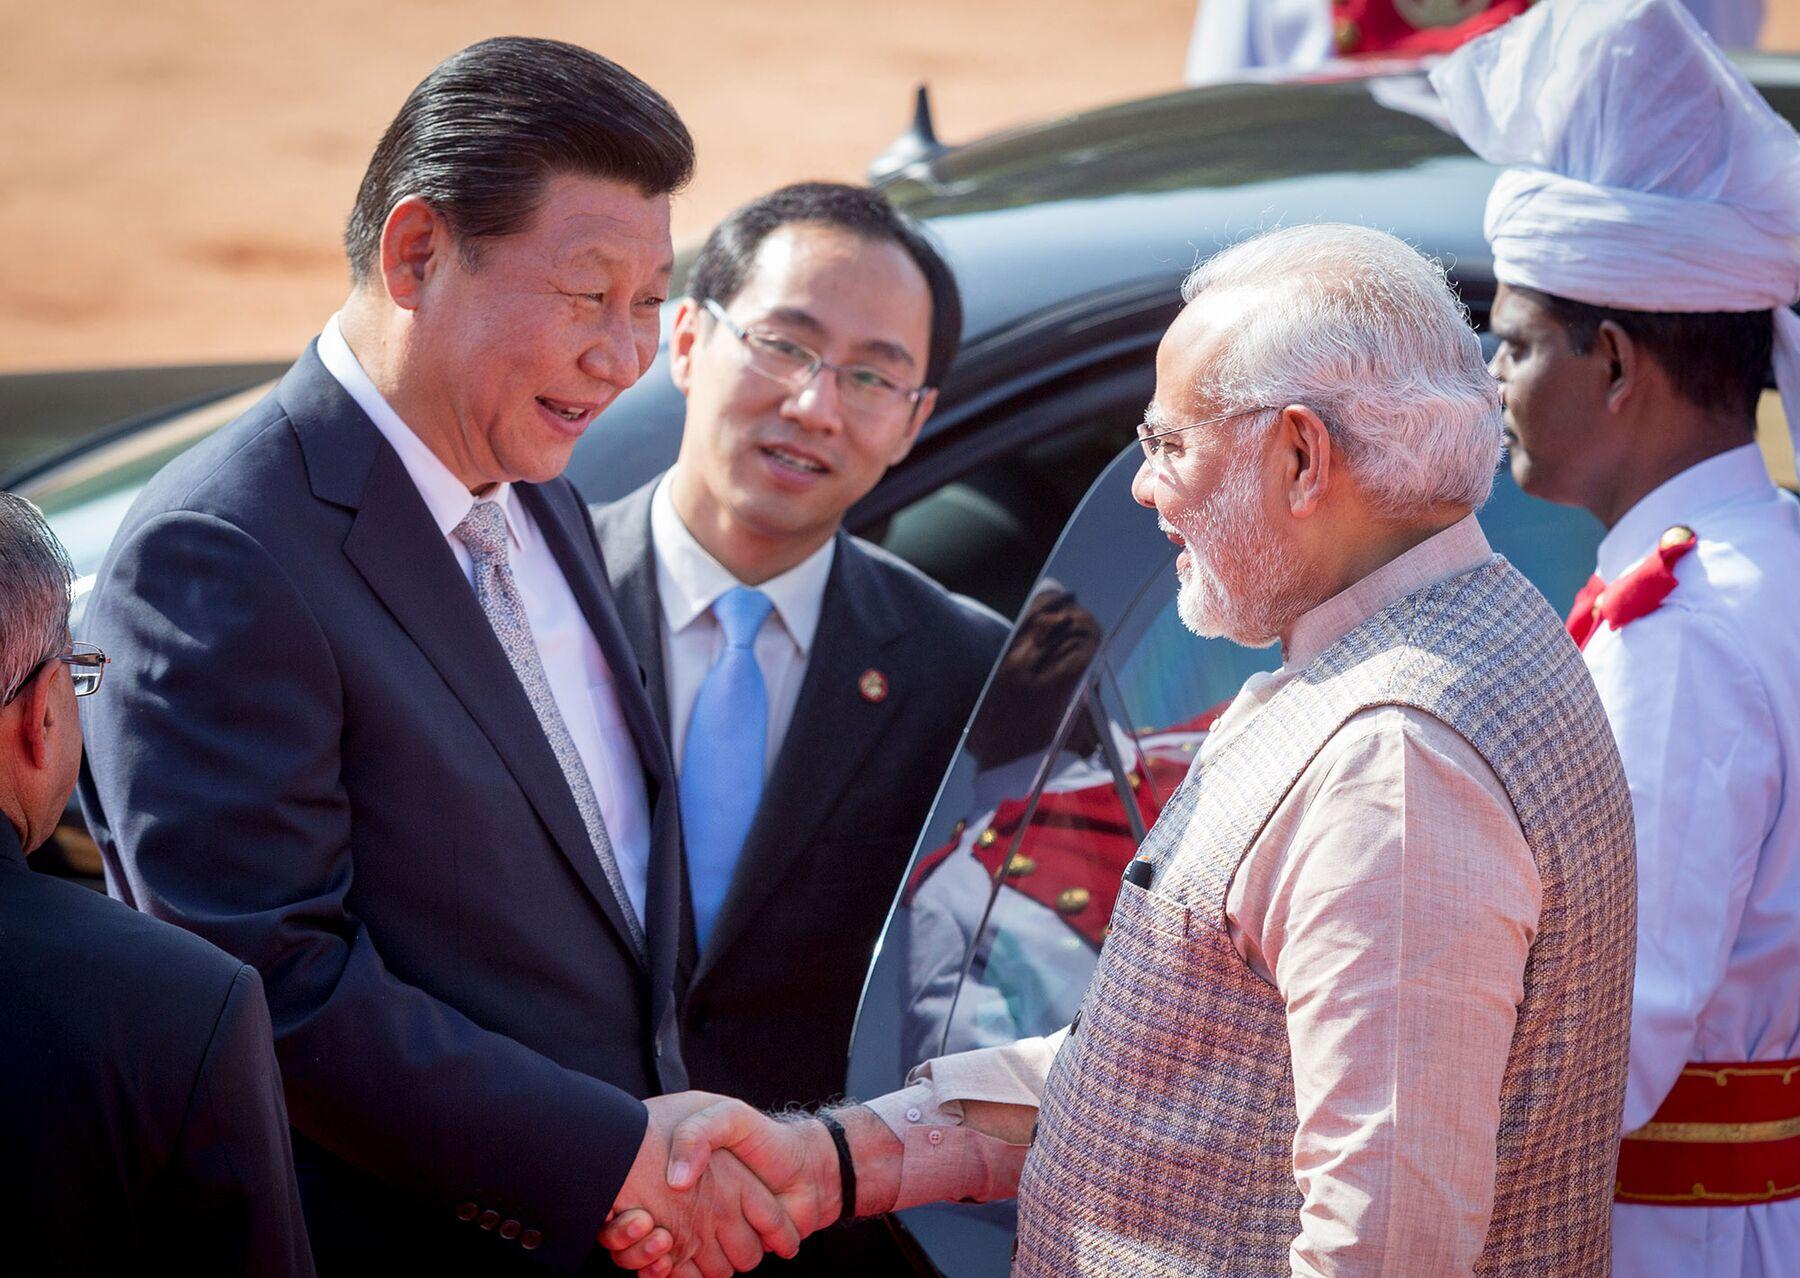 Xi Jinping and Narendra Modi in New Delhi in 2014.